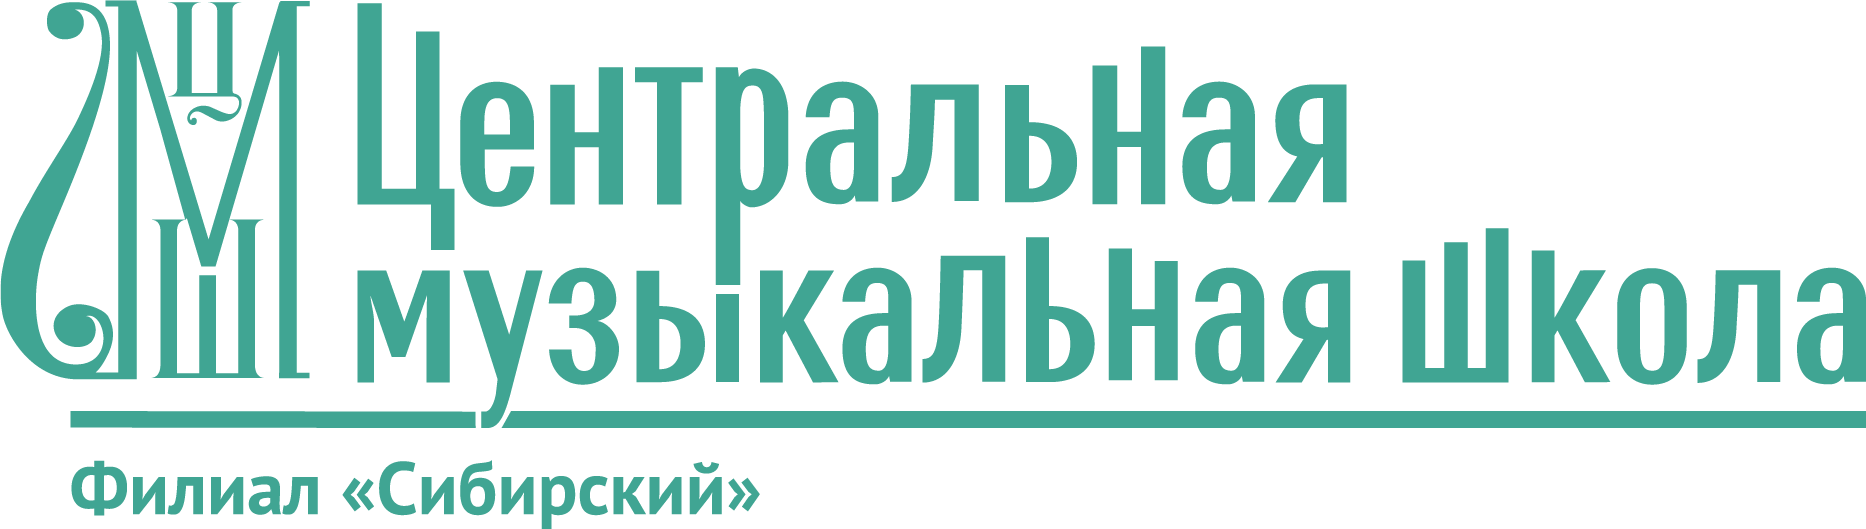 "Филиал ЦМШ ""Сибирский"""